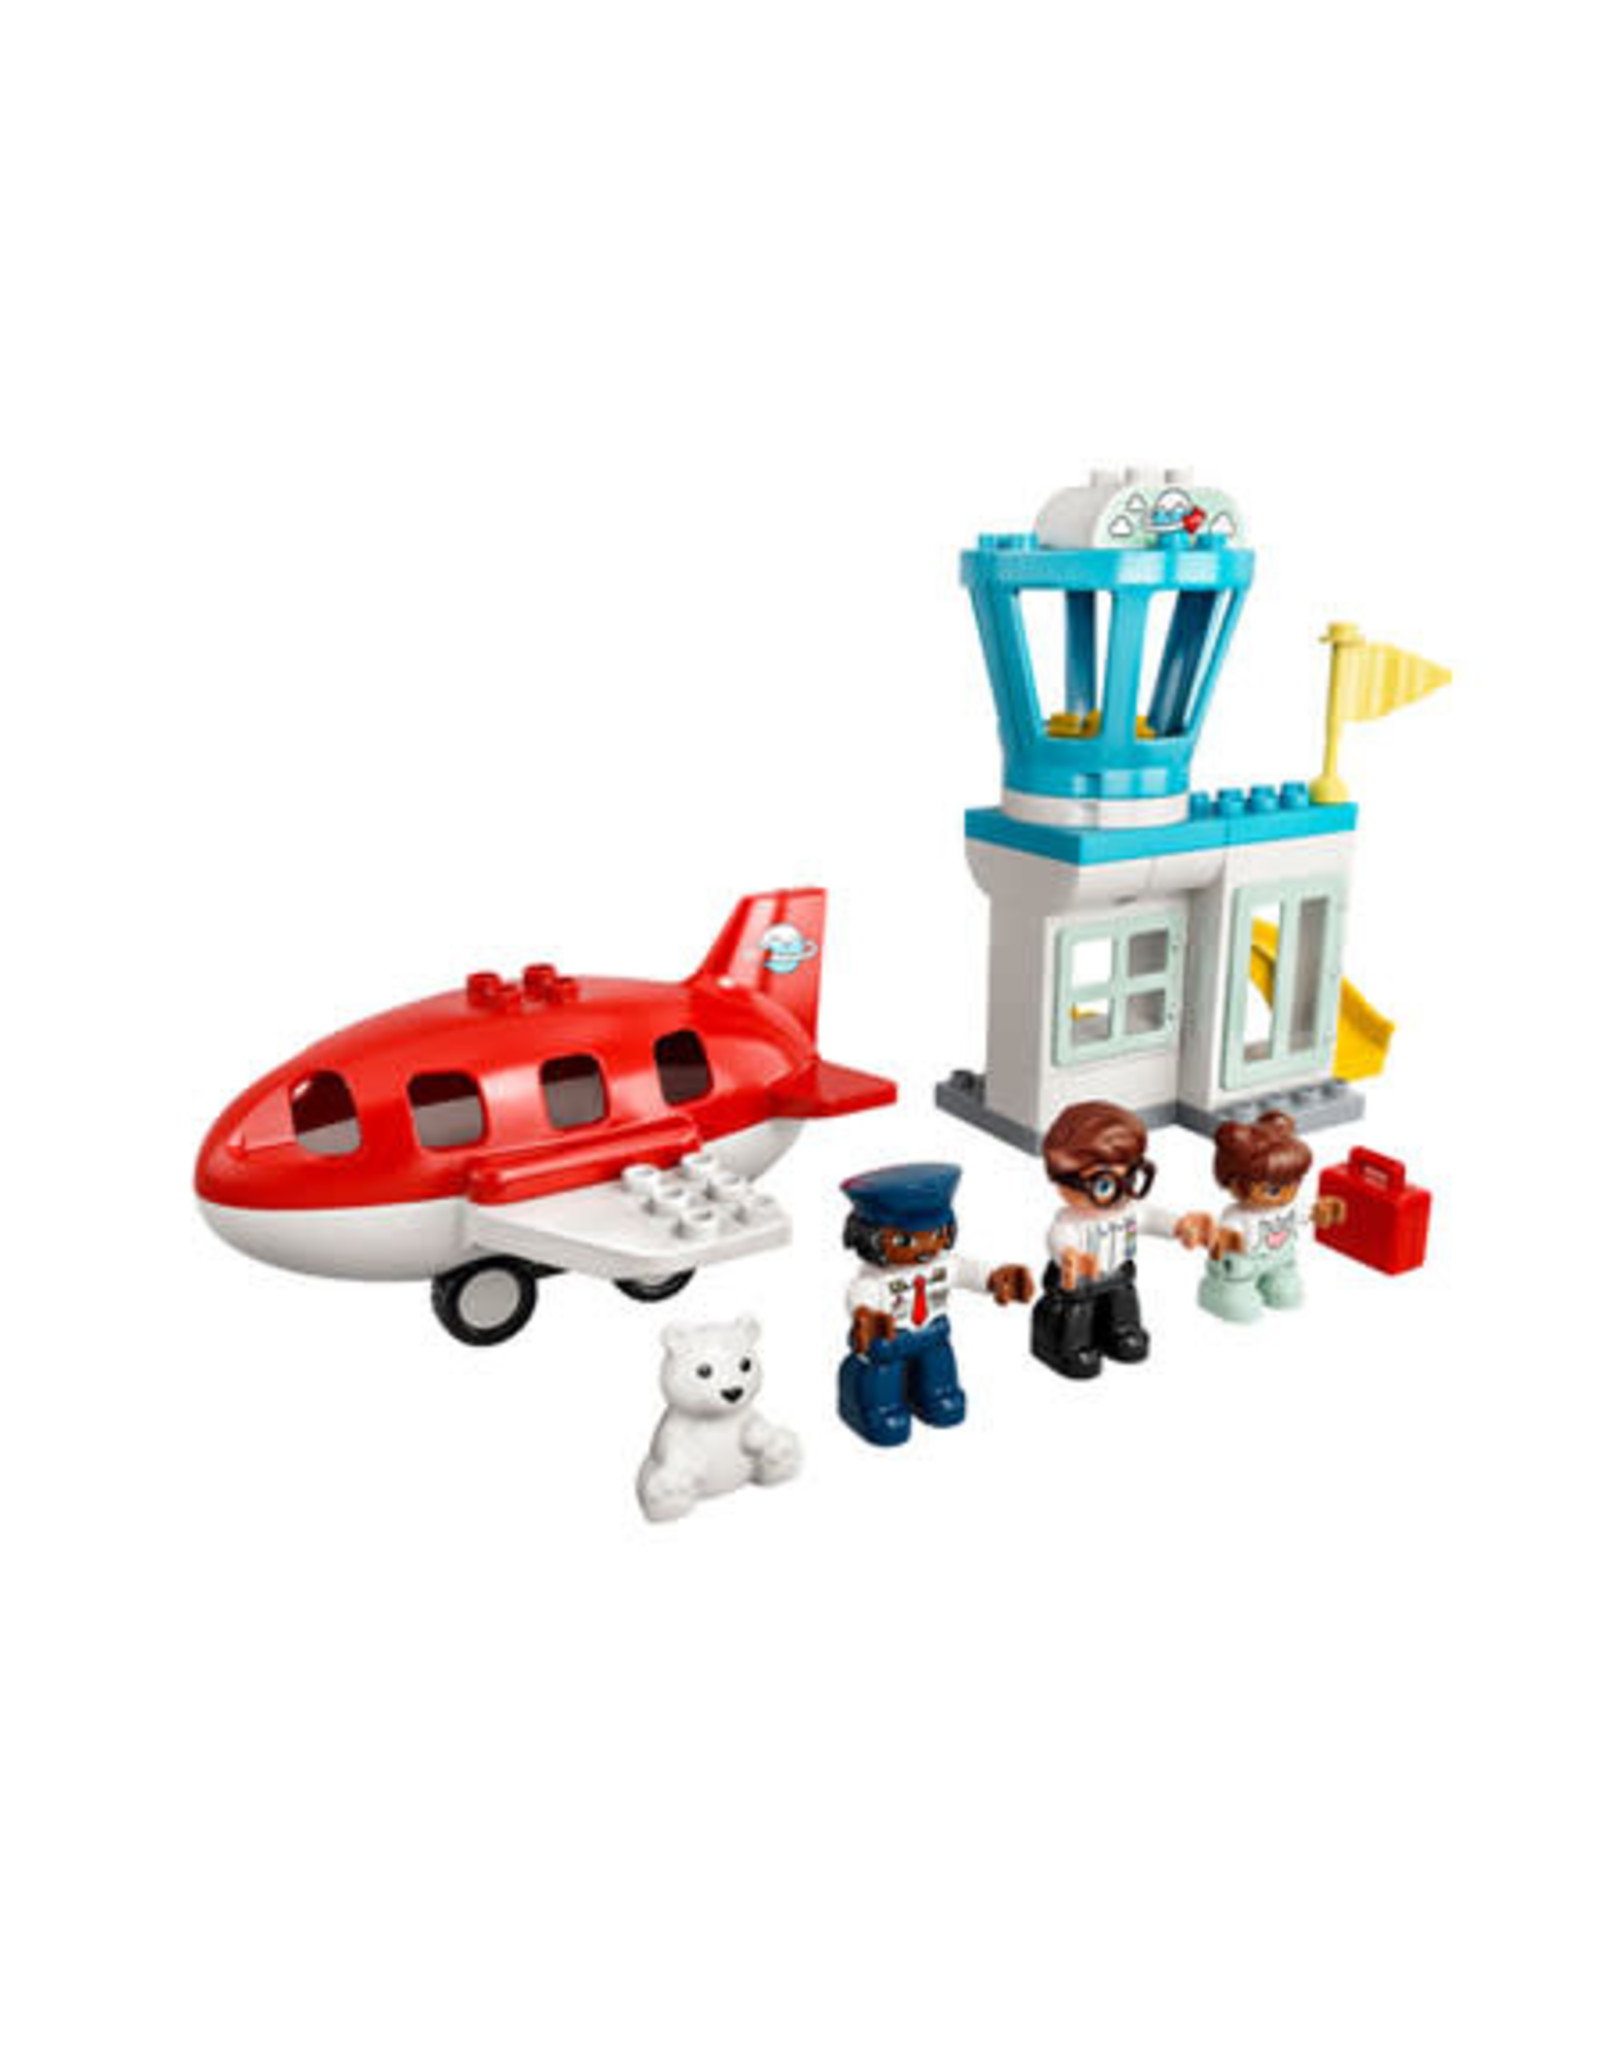 LEGO LEGO 10961 Stad Vliegtuig en Vliegveld DUPLO NIEUW